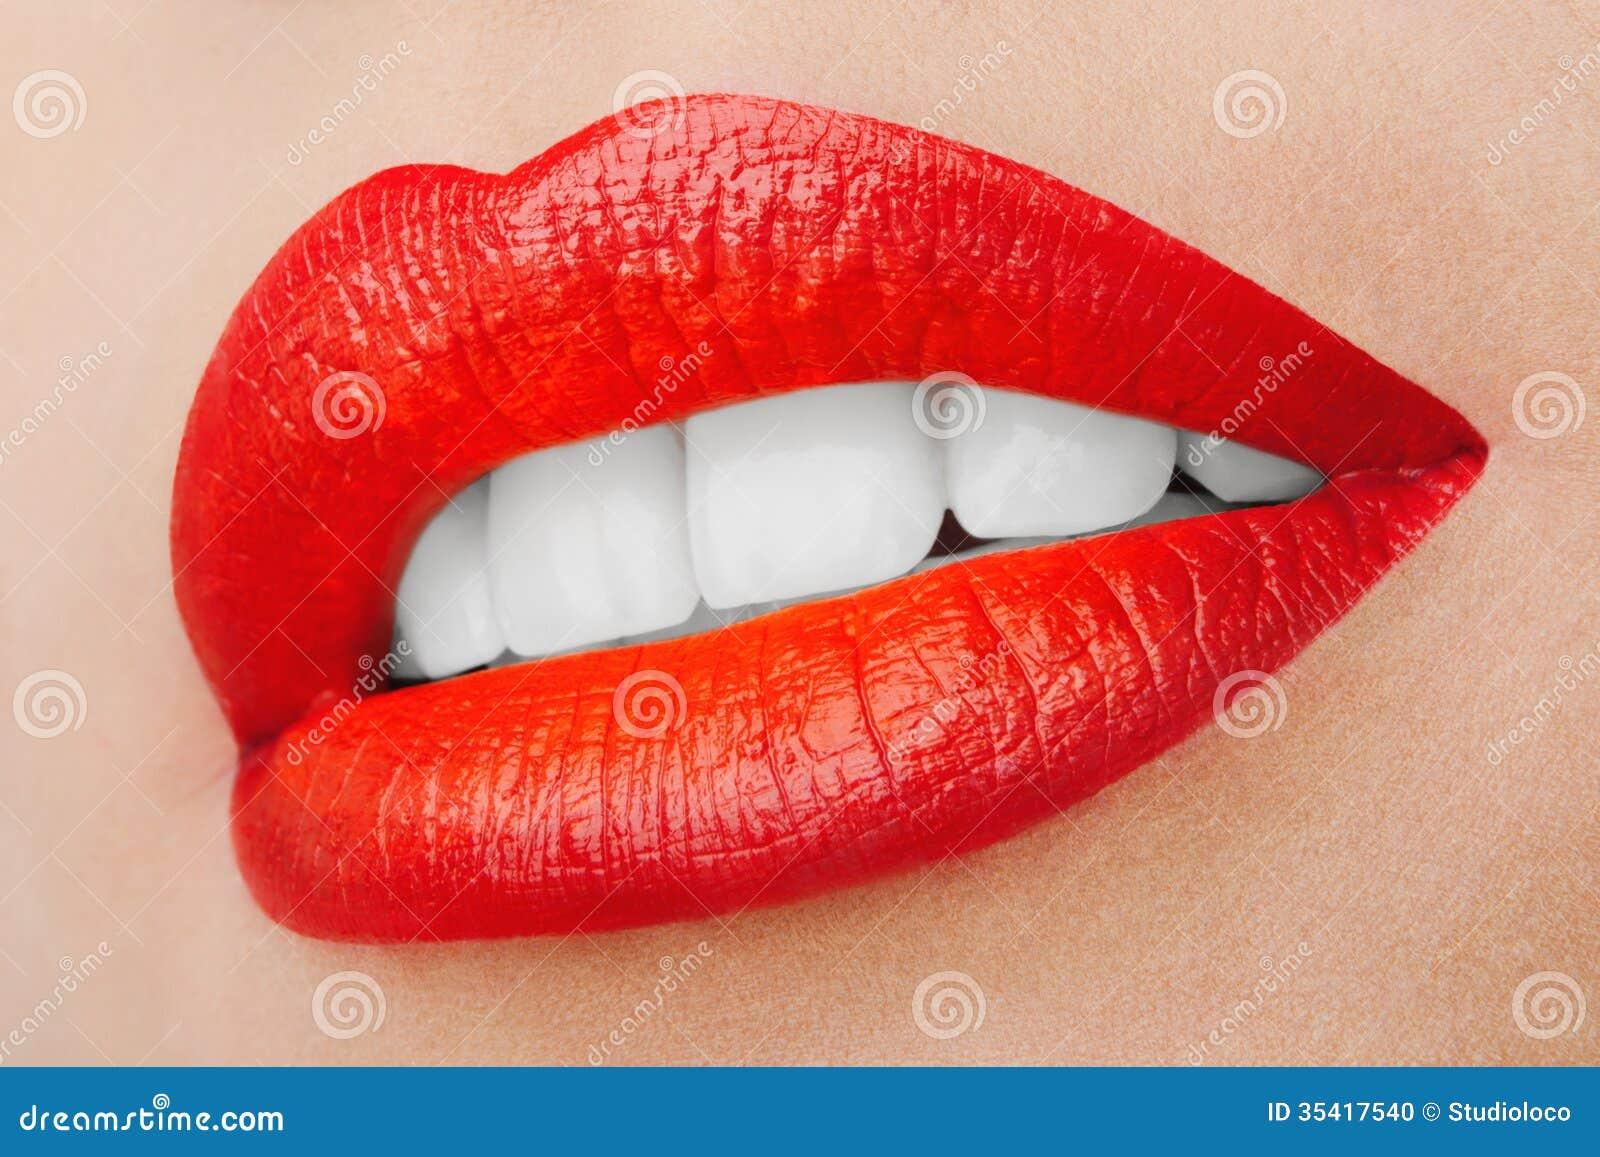 sch ne l chelnde lippen stockfoto bild 35417540. Black Bedroom Furniture Sets. Home Design Ideas